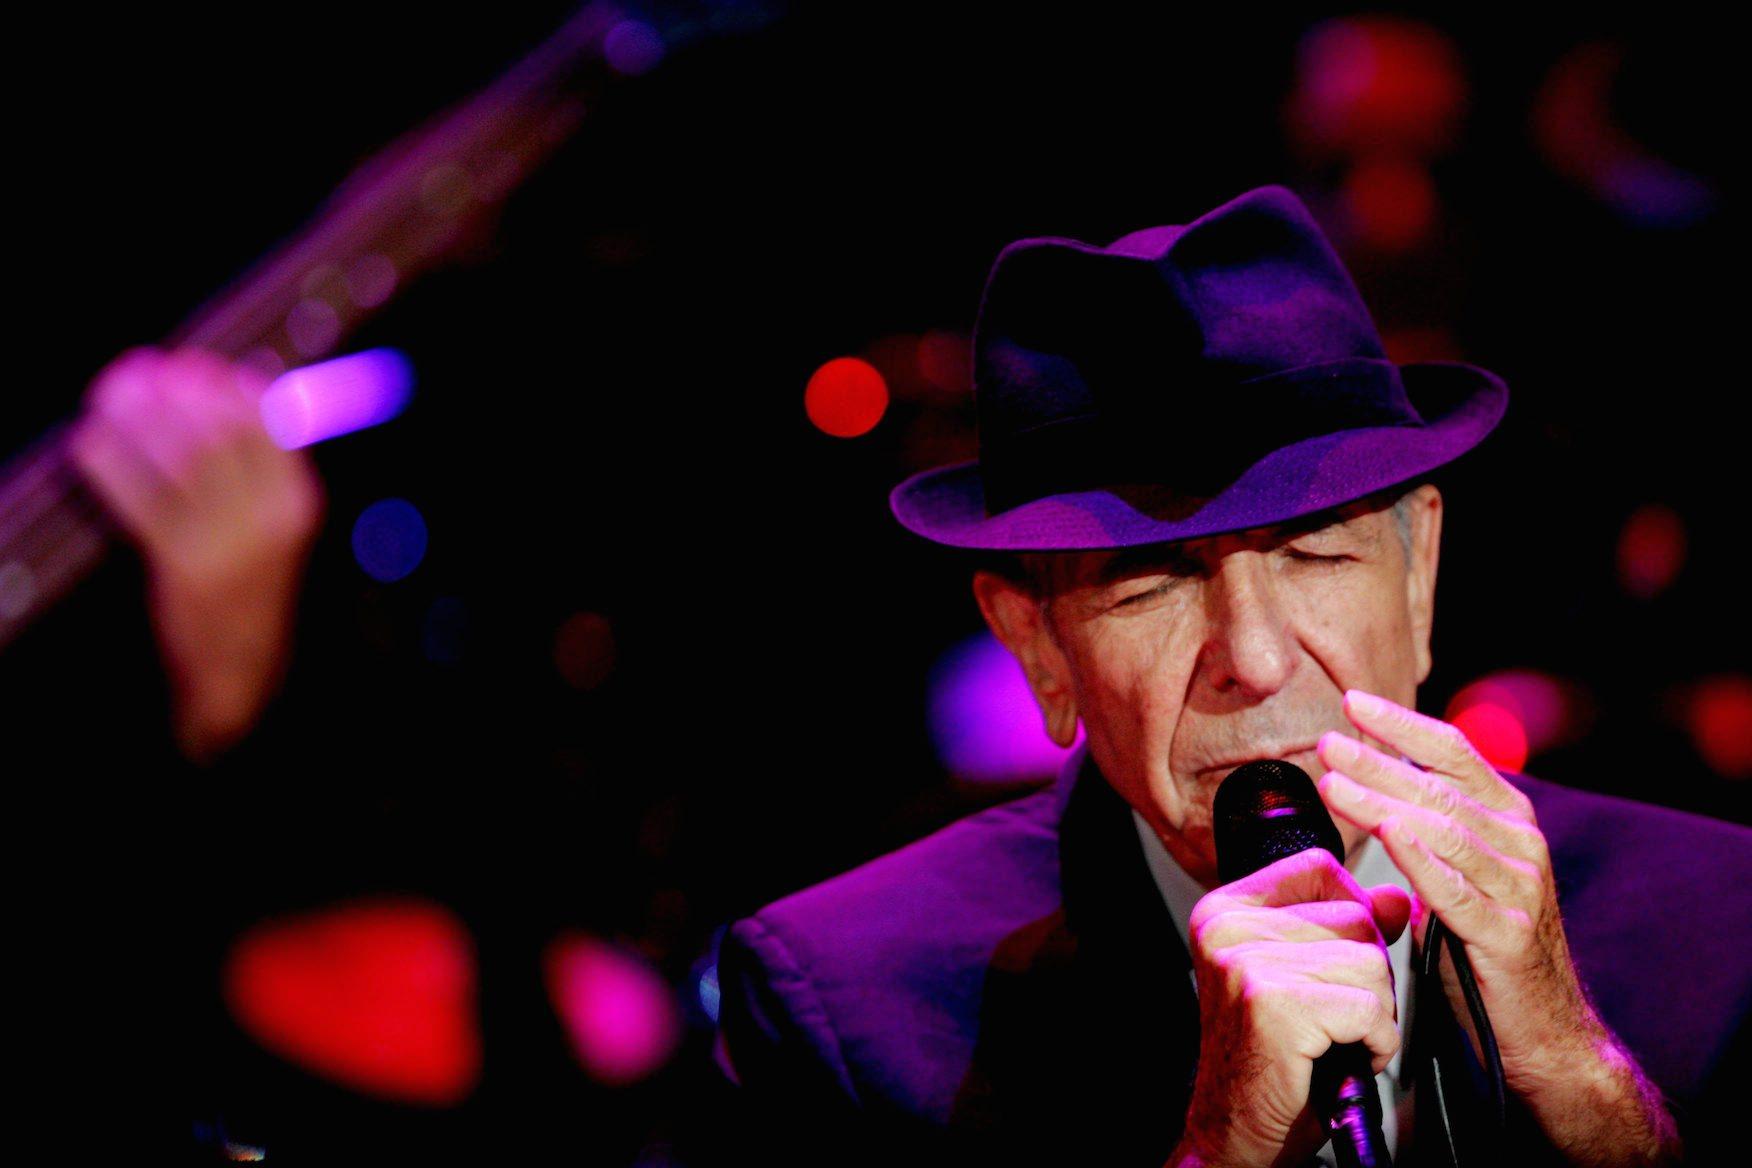 Música para casamento:  Hallelujah – Leonard Cohen (Shrek)